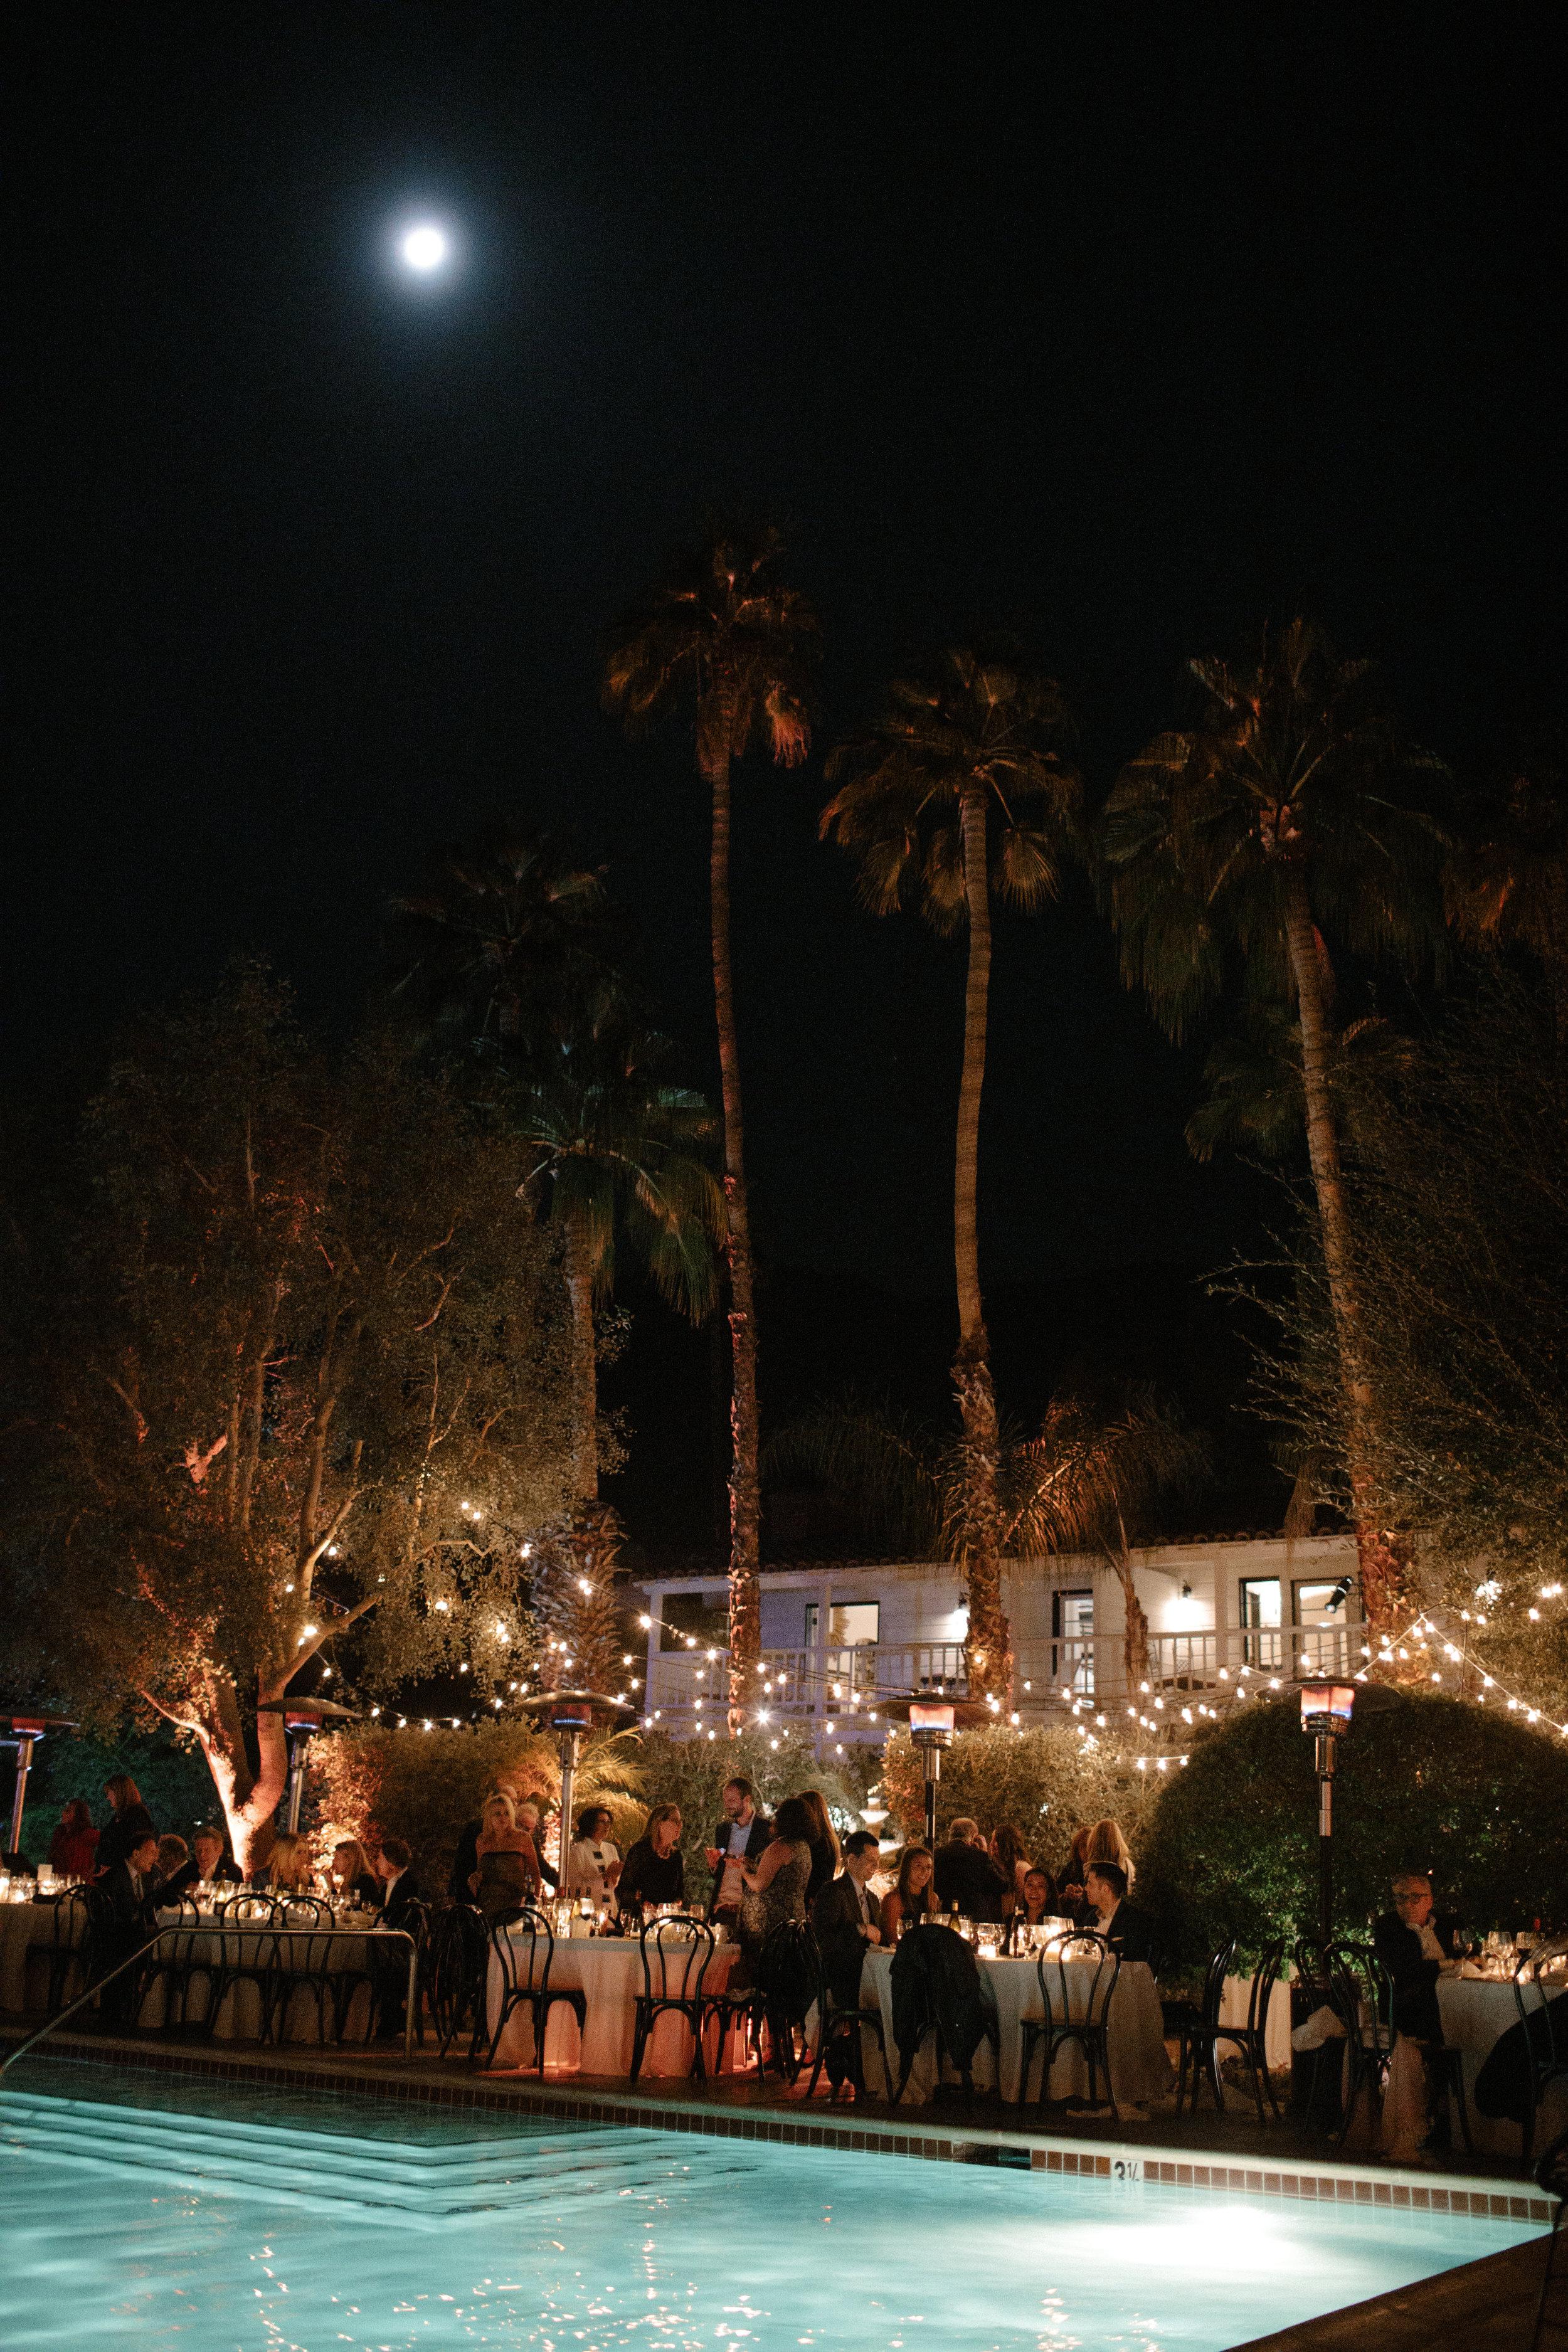 Dara_&_Garrett_Colony_Palms_Hotel_Wedding_Photos-466.jpg